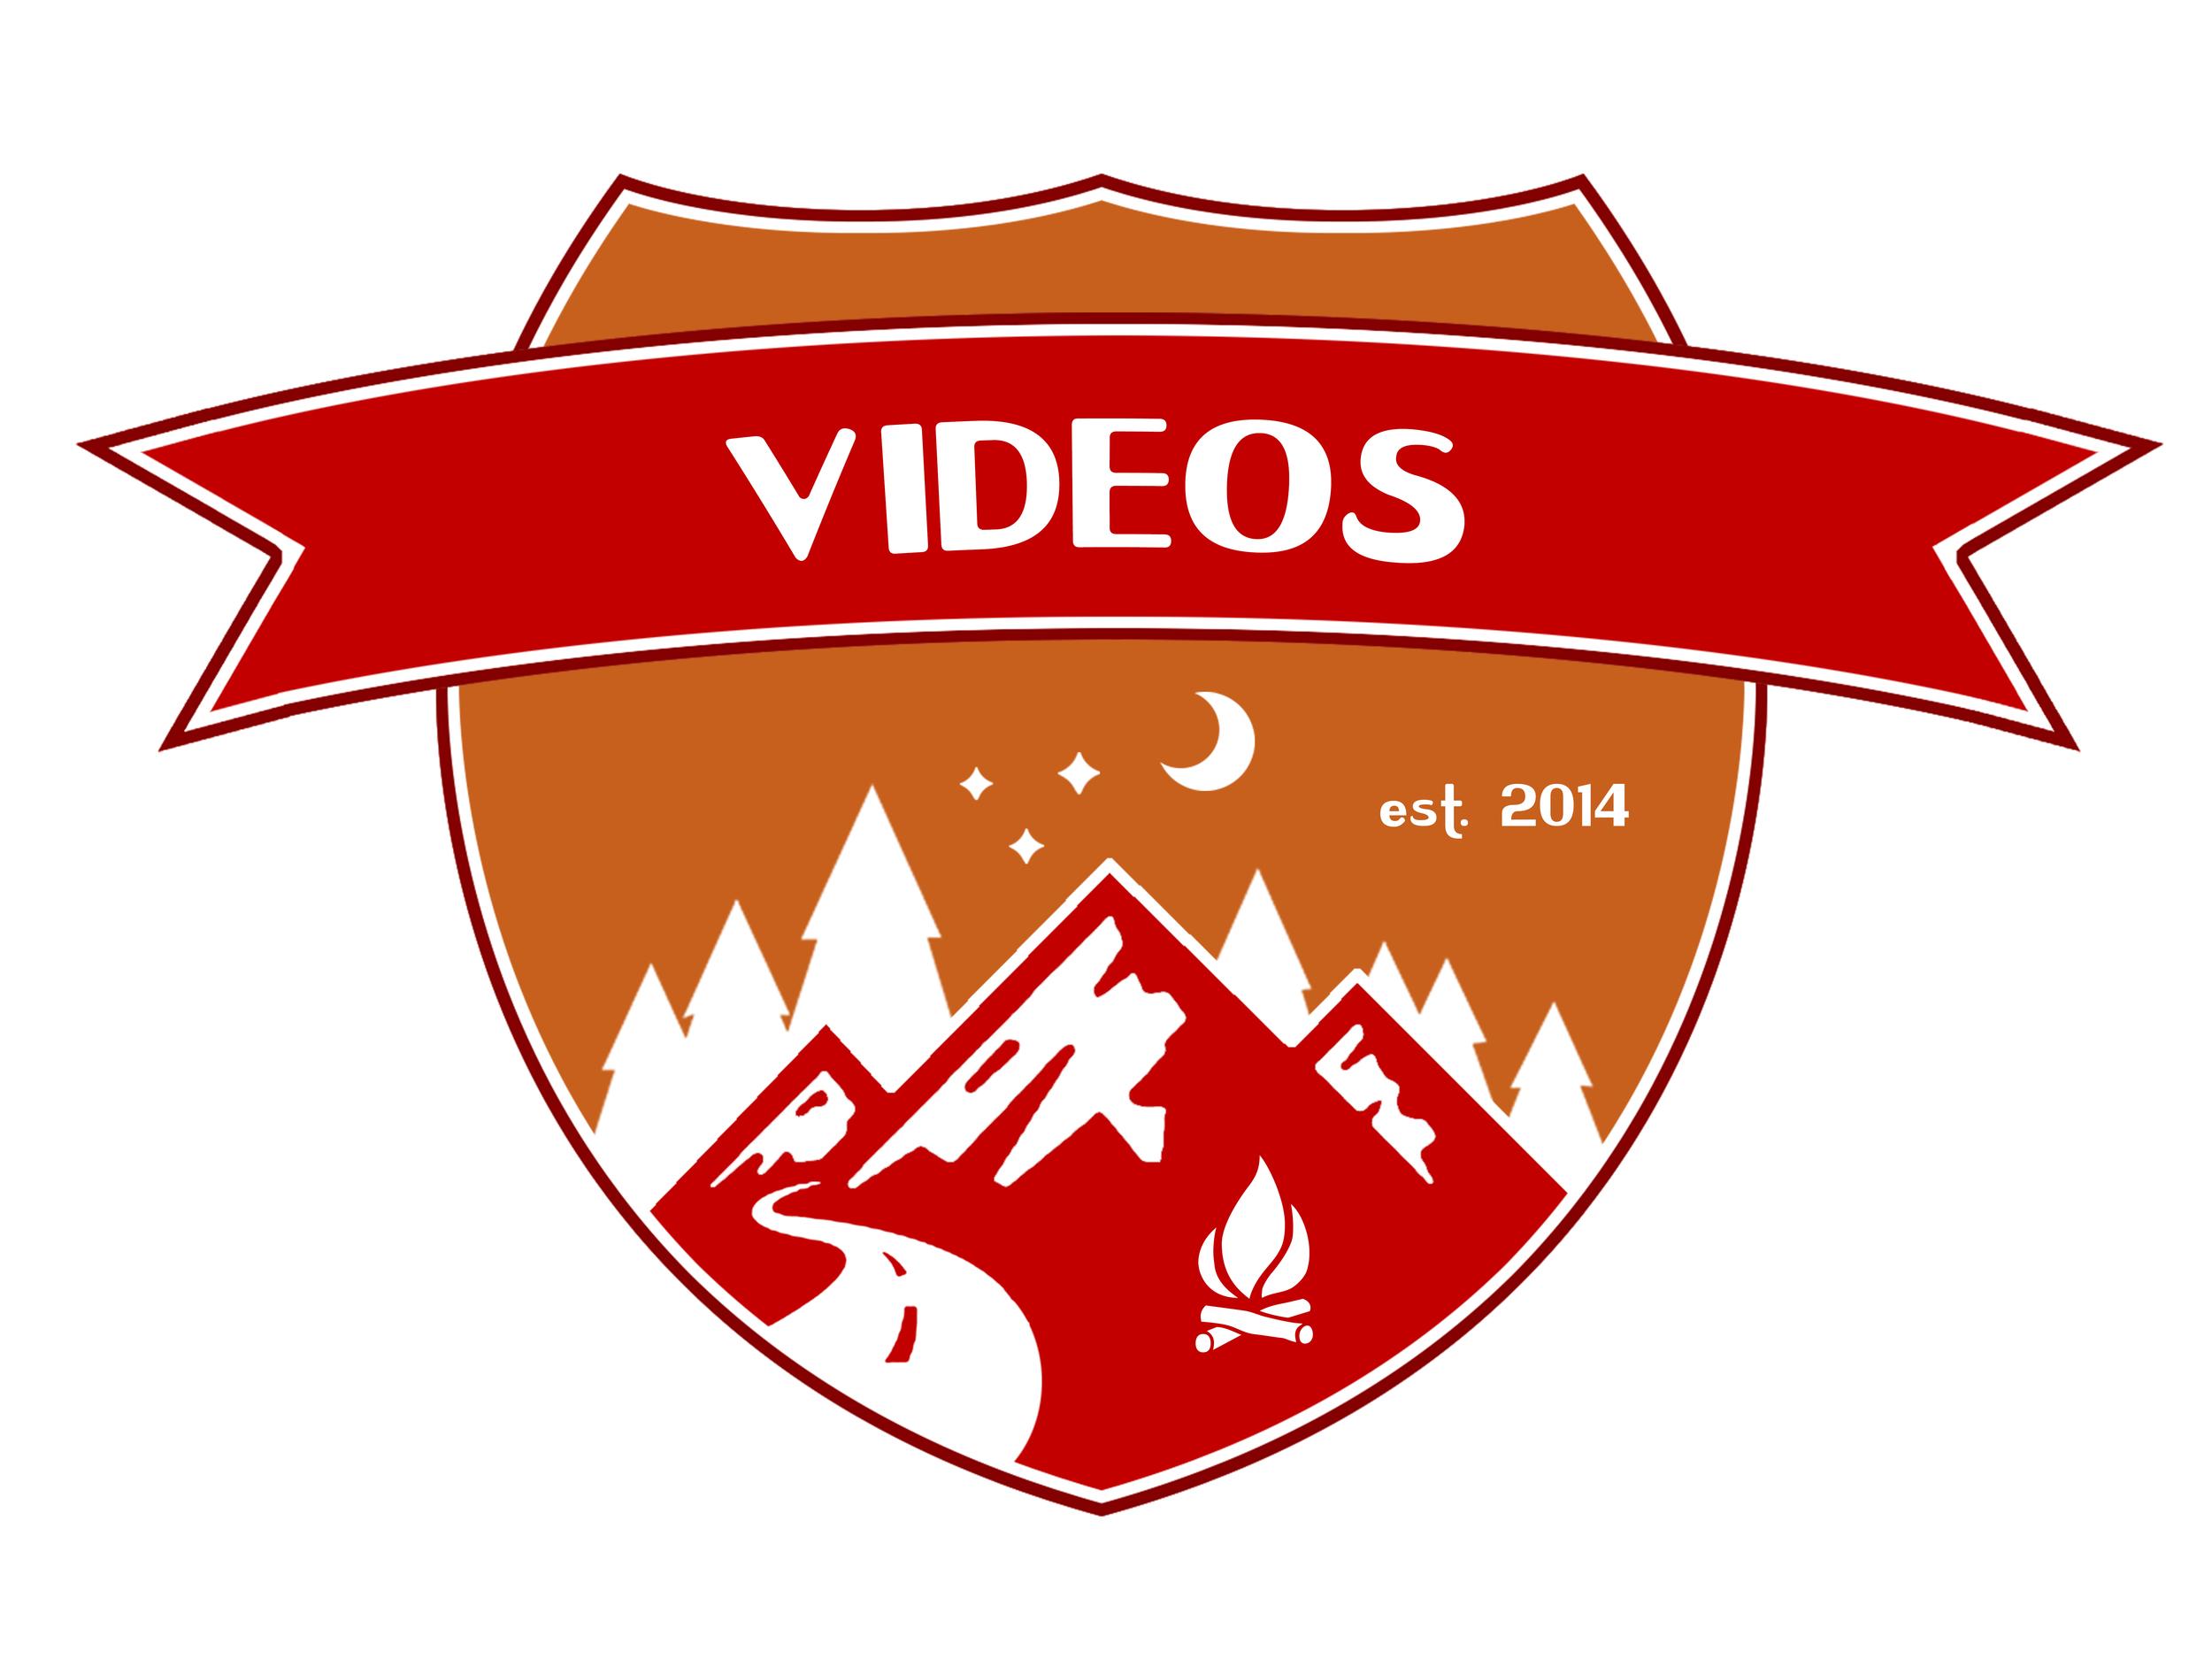 Campbulance VIDEOS.jpg